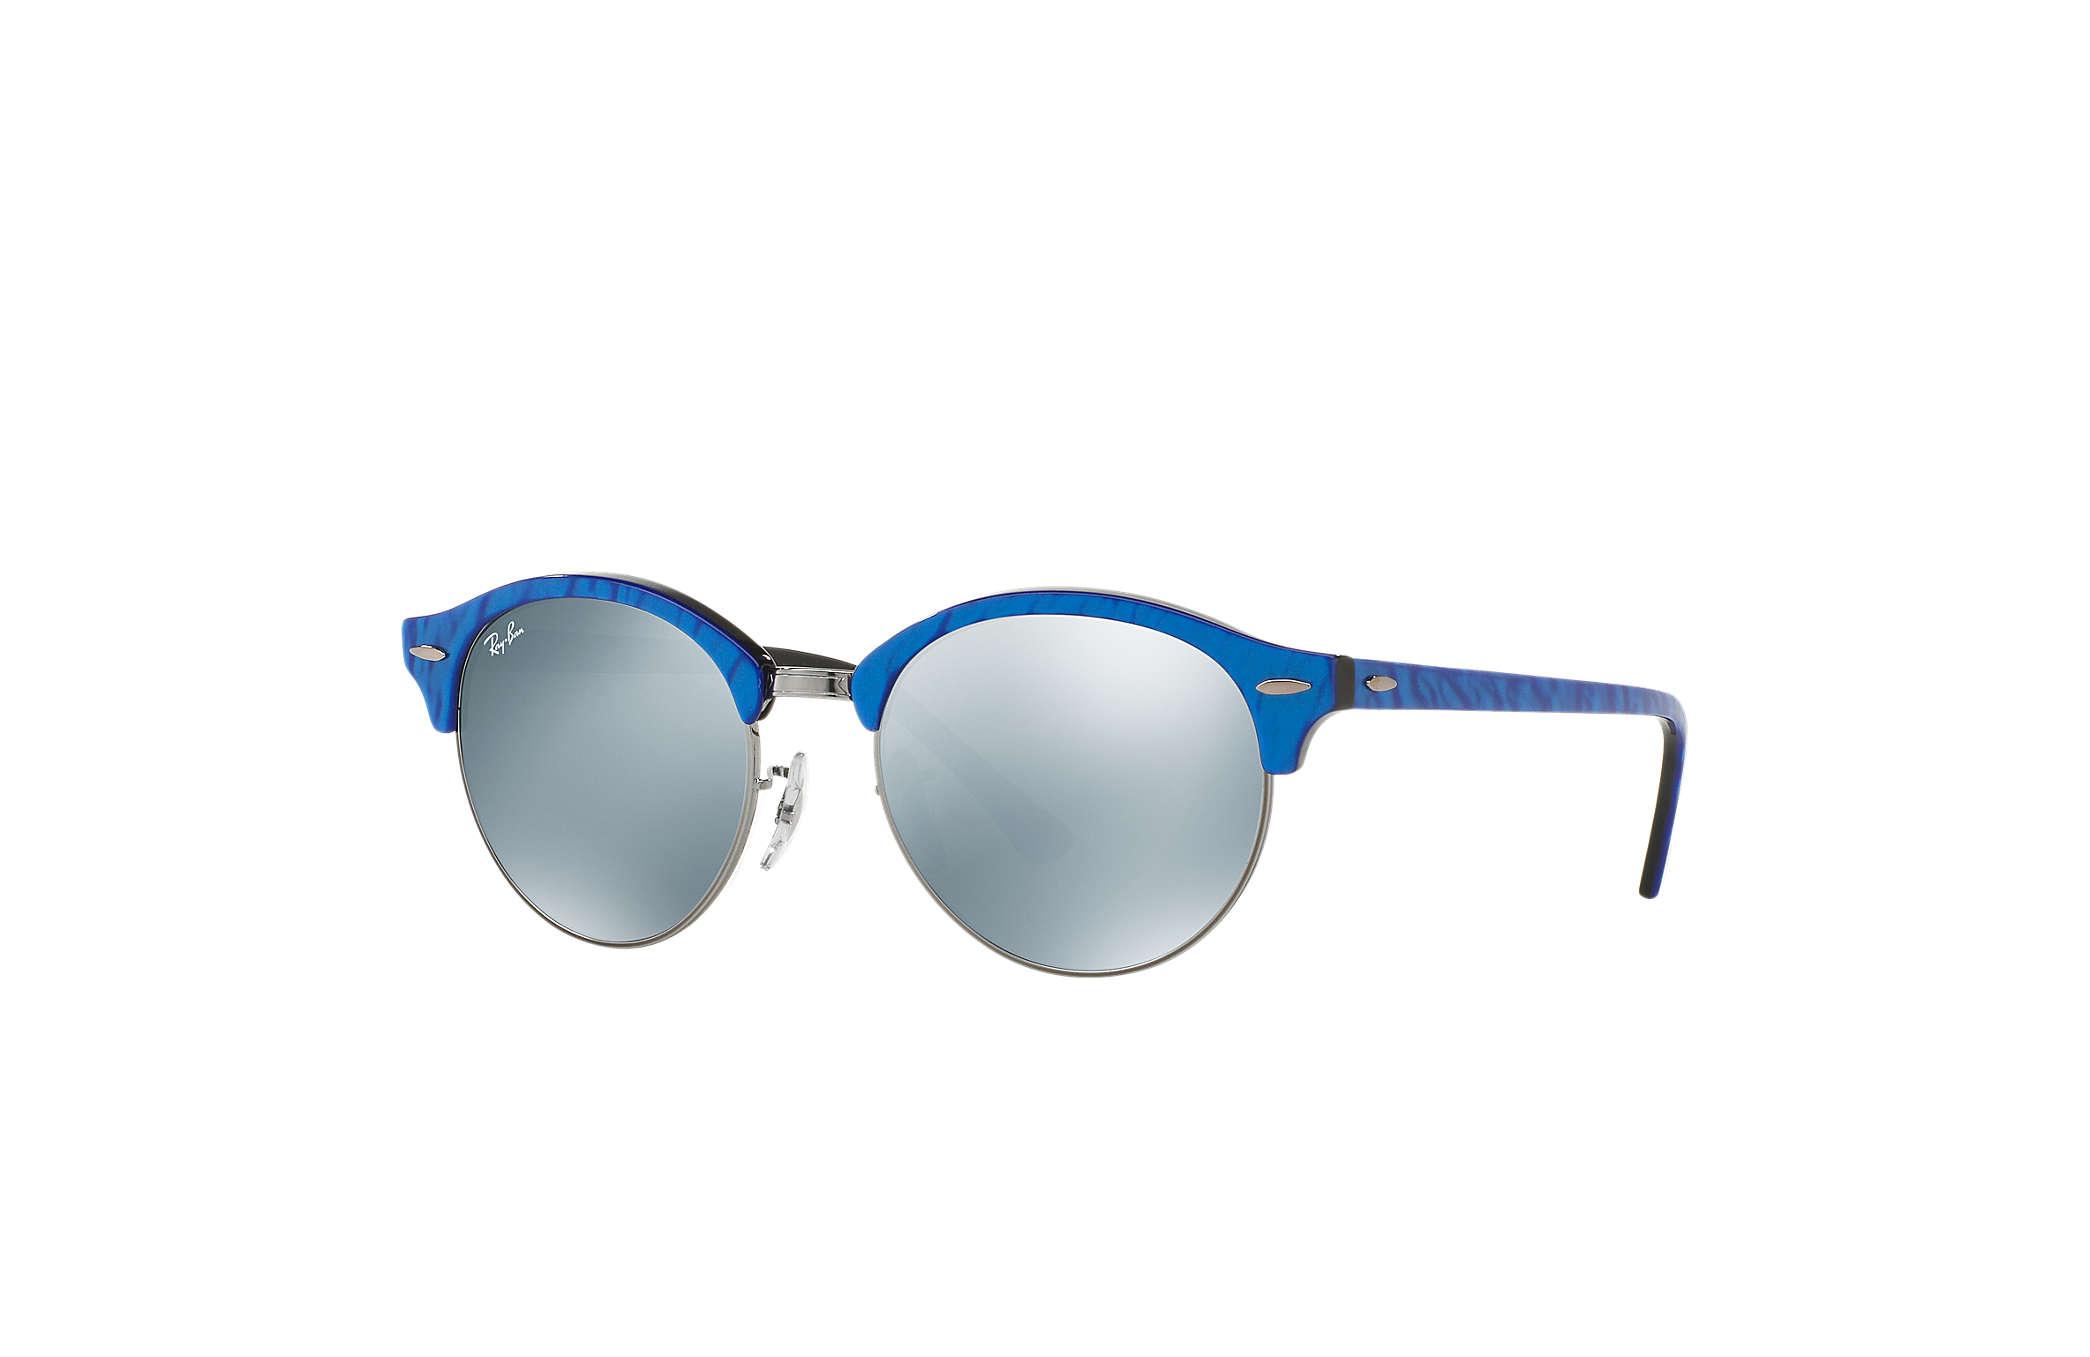 Ray-Ban Clubround Flash Lenses RB4246 Azul - Acetato - Lentes Prata ... ed348cceec